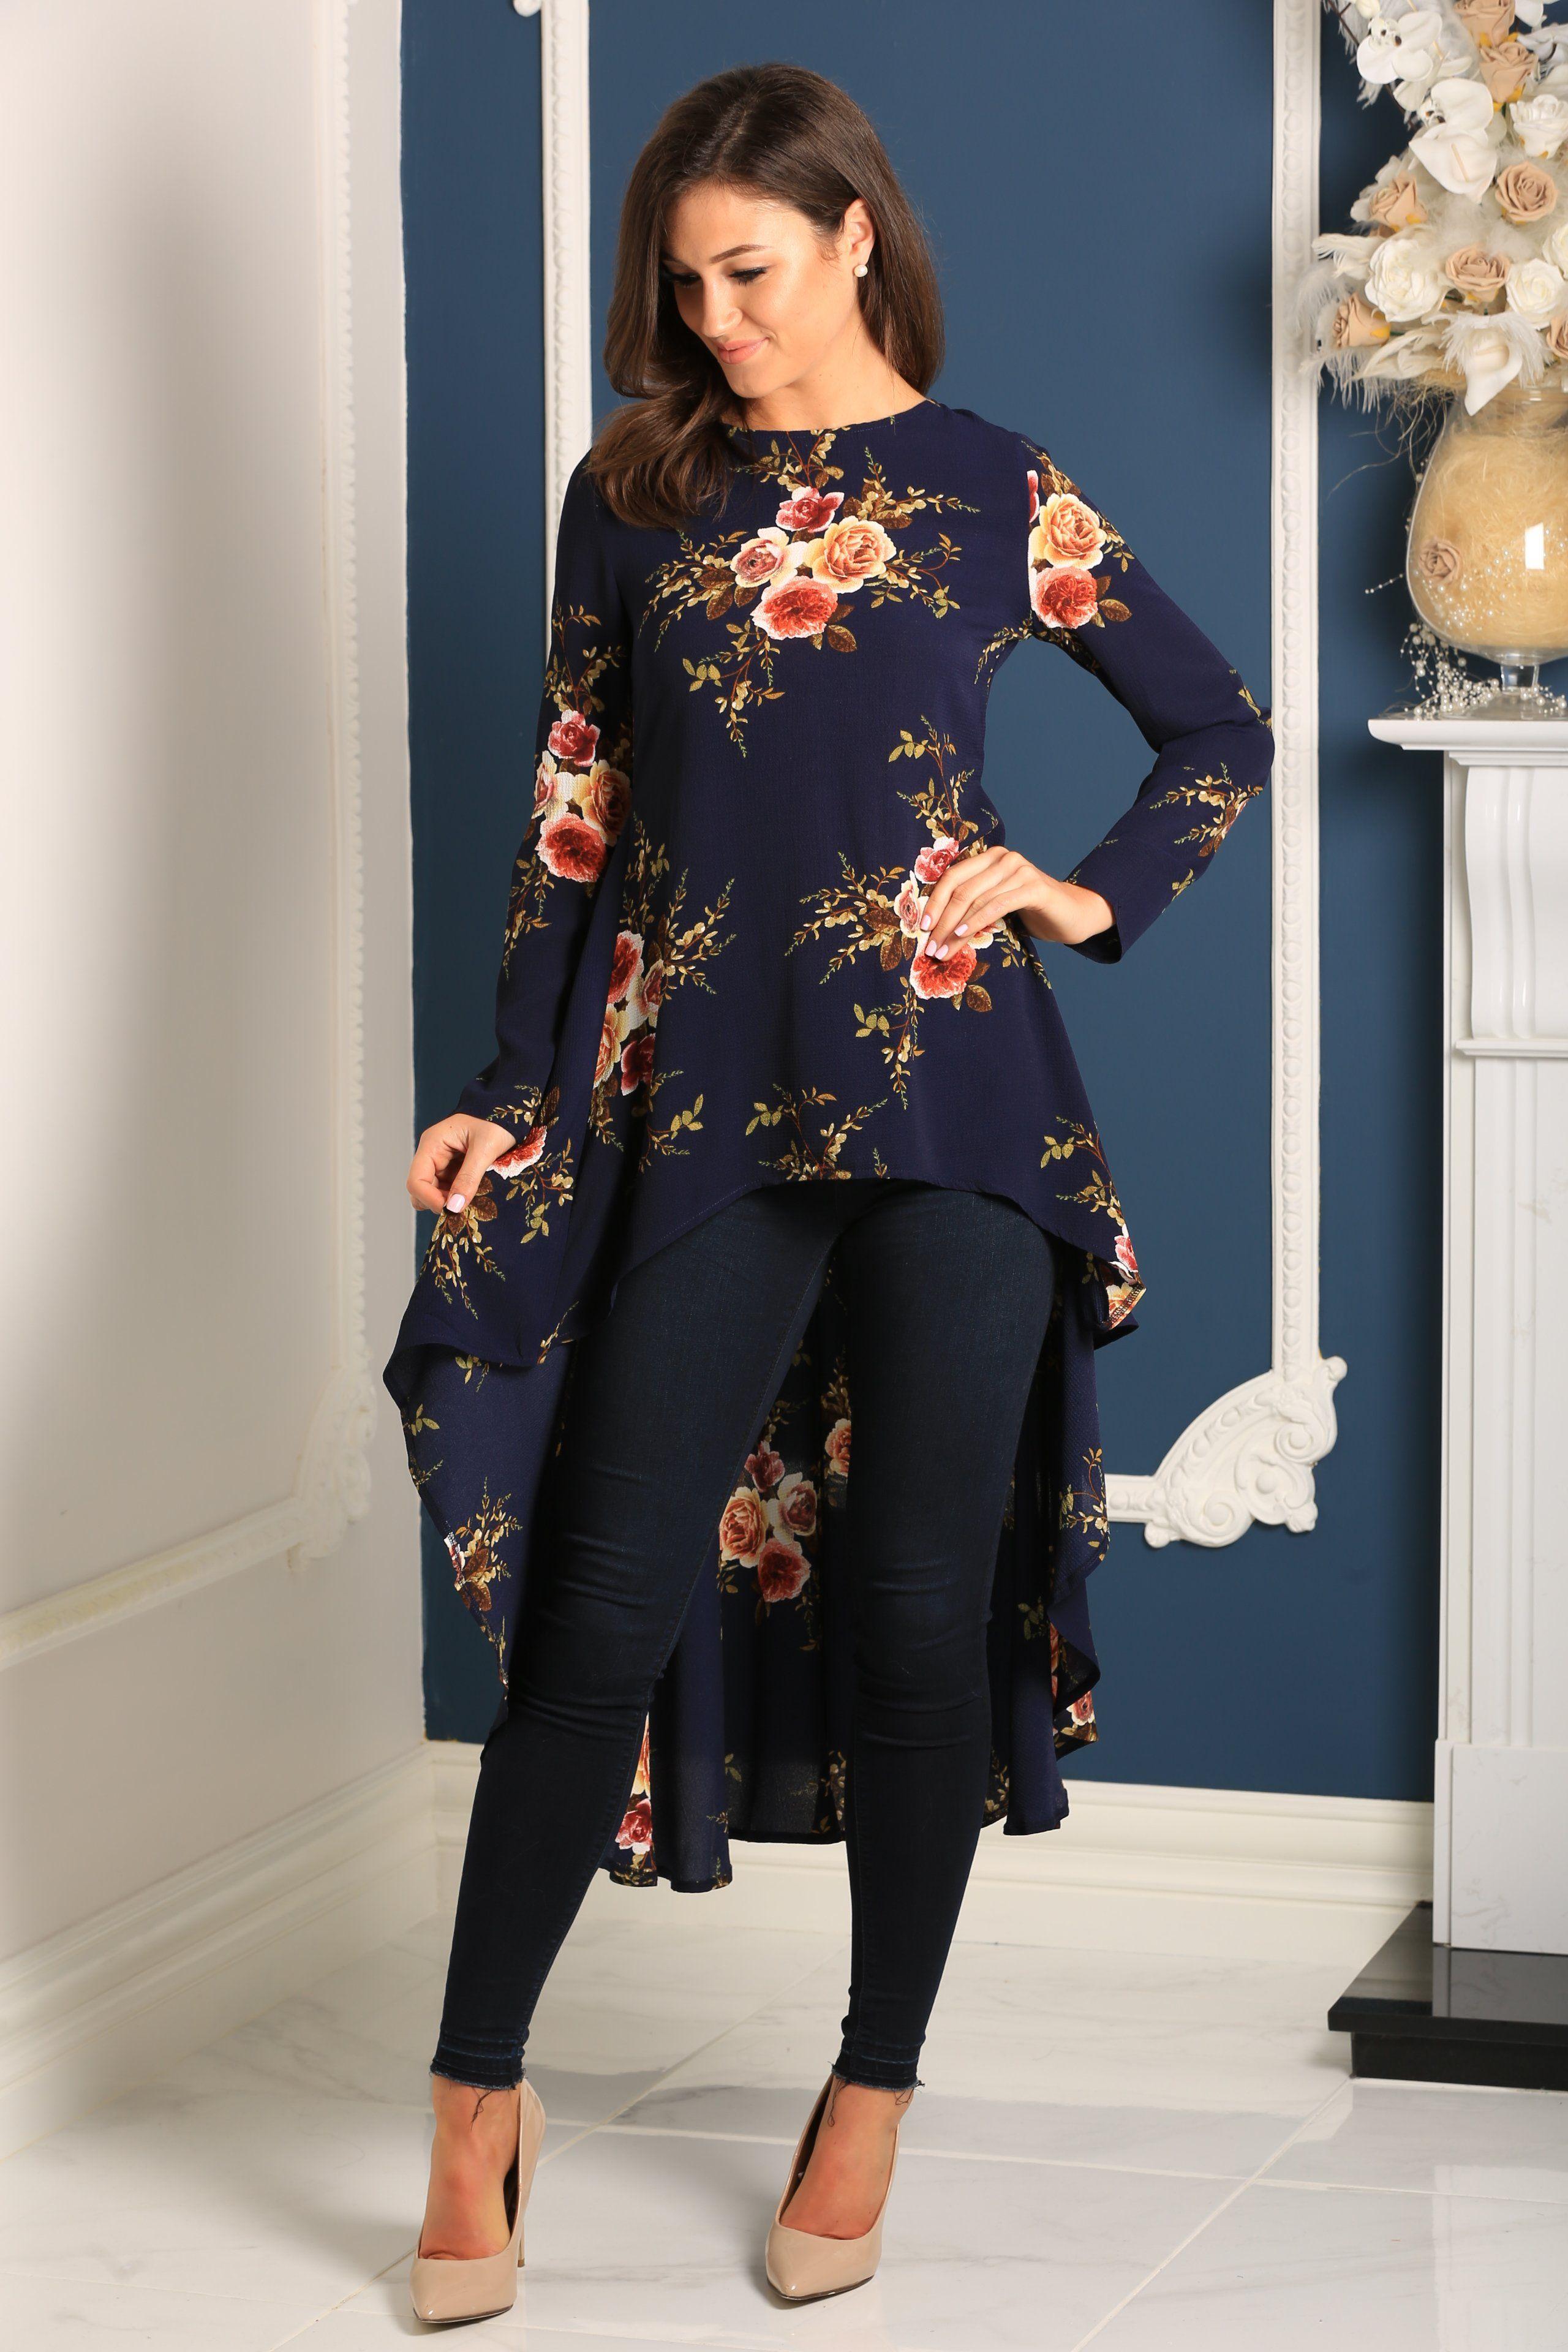 Paula navy floral print dipped back top powder blue wedding wear